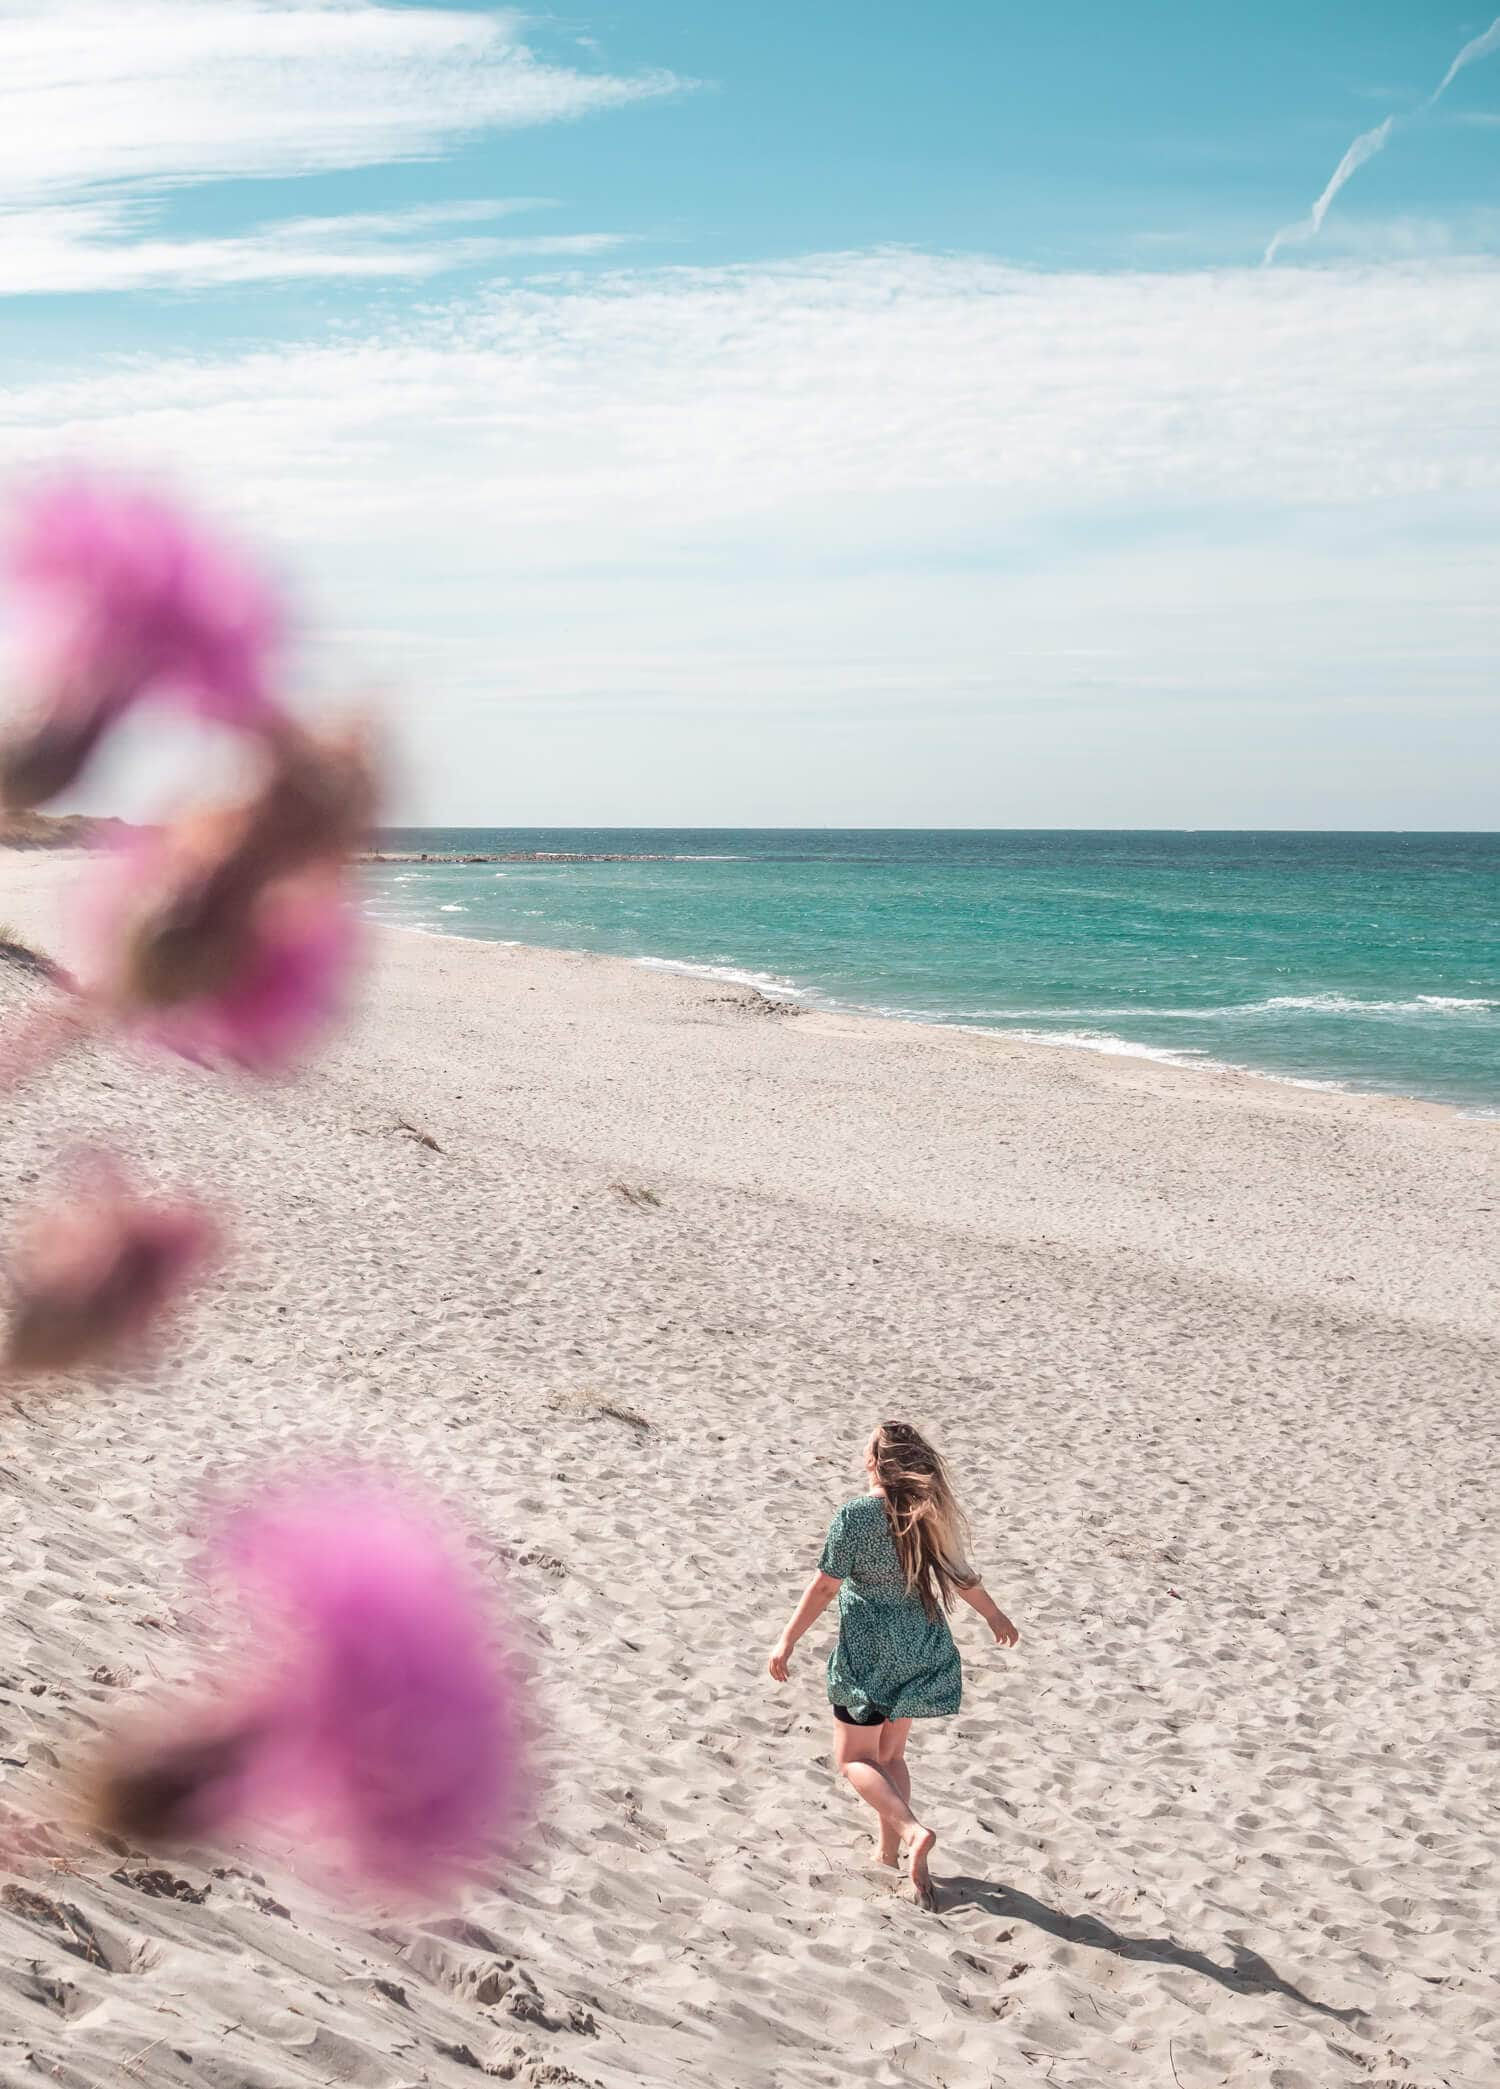 Girl running on the beautiful Orrestranda beach on the Jæren coast just south of Stavanger